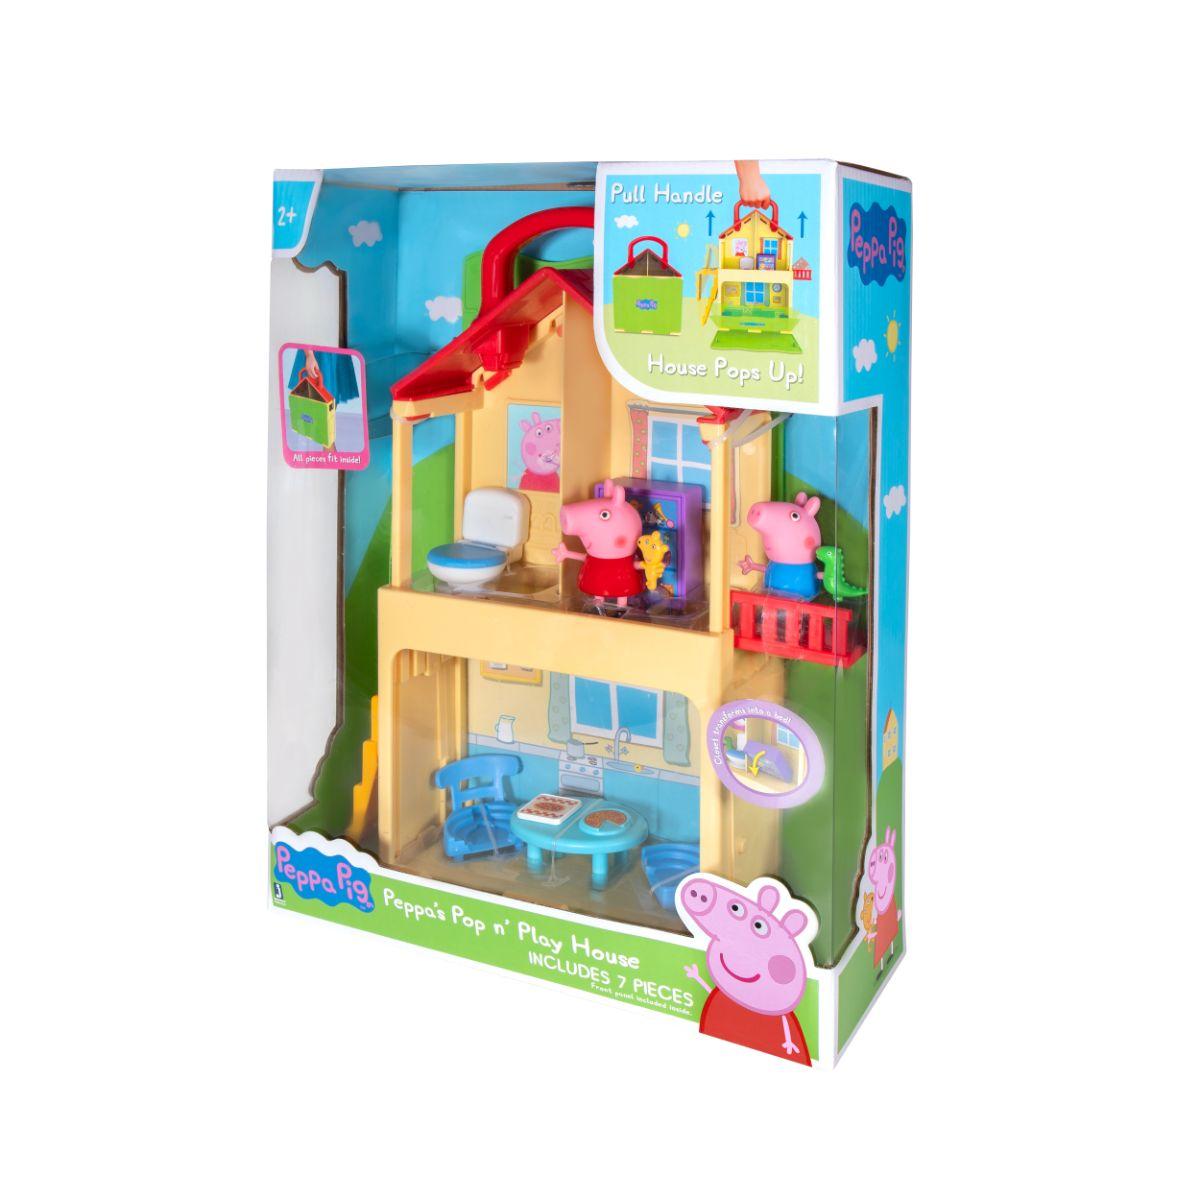 Set de joaca Peppa Play House, Peppa Pig